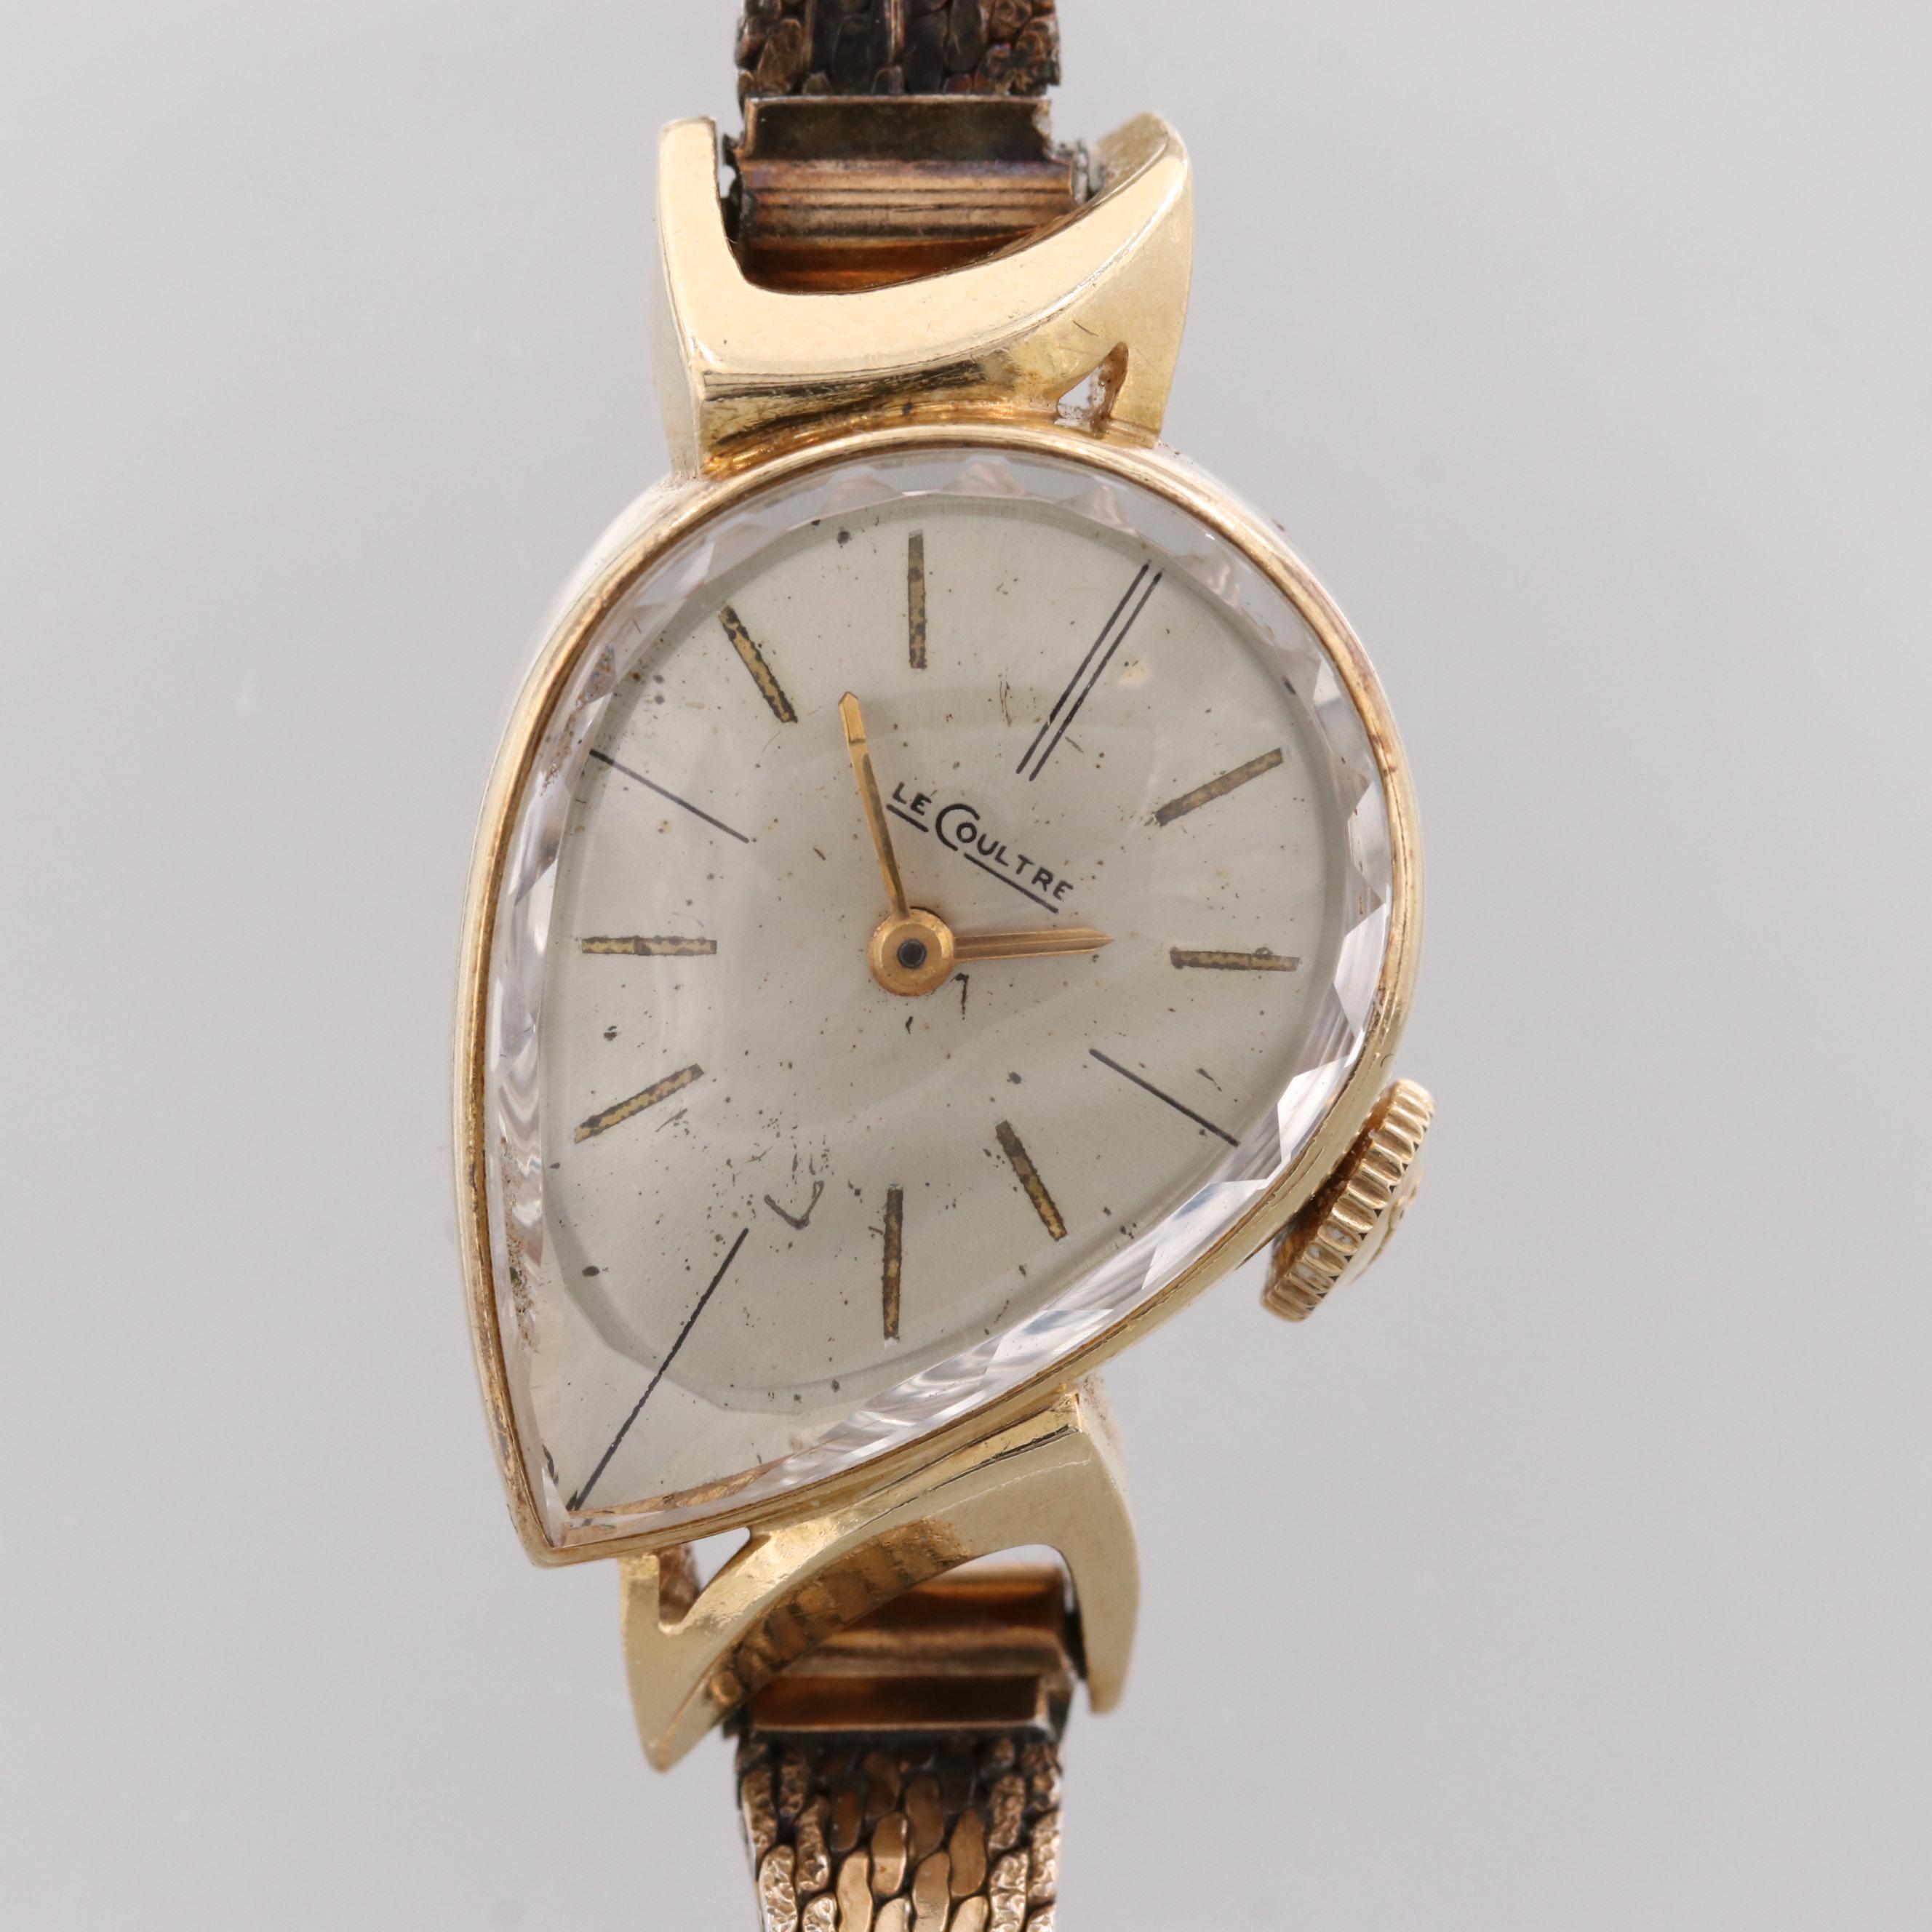 LeCoultre 14K Yellow Gold Pear Shaped Case Wristwatch